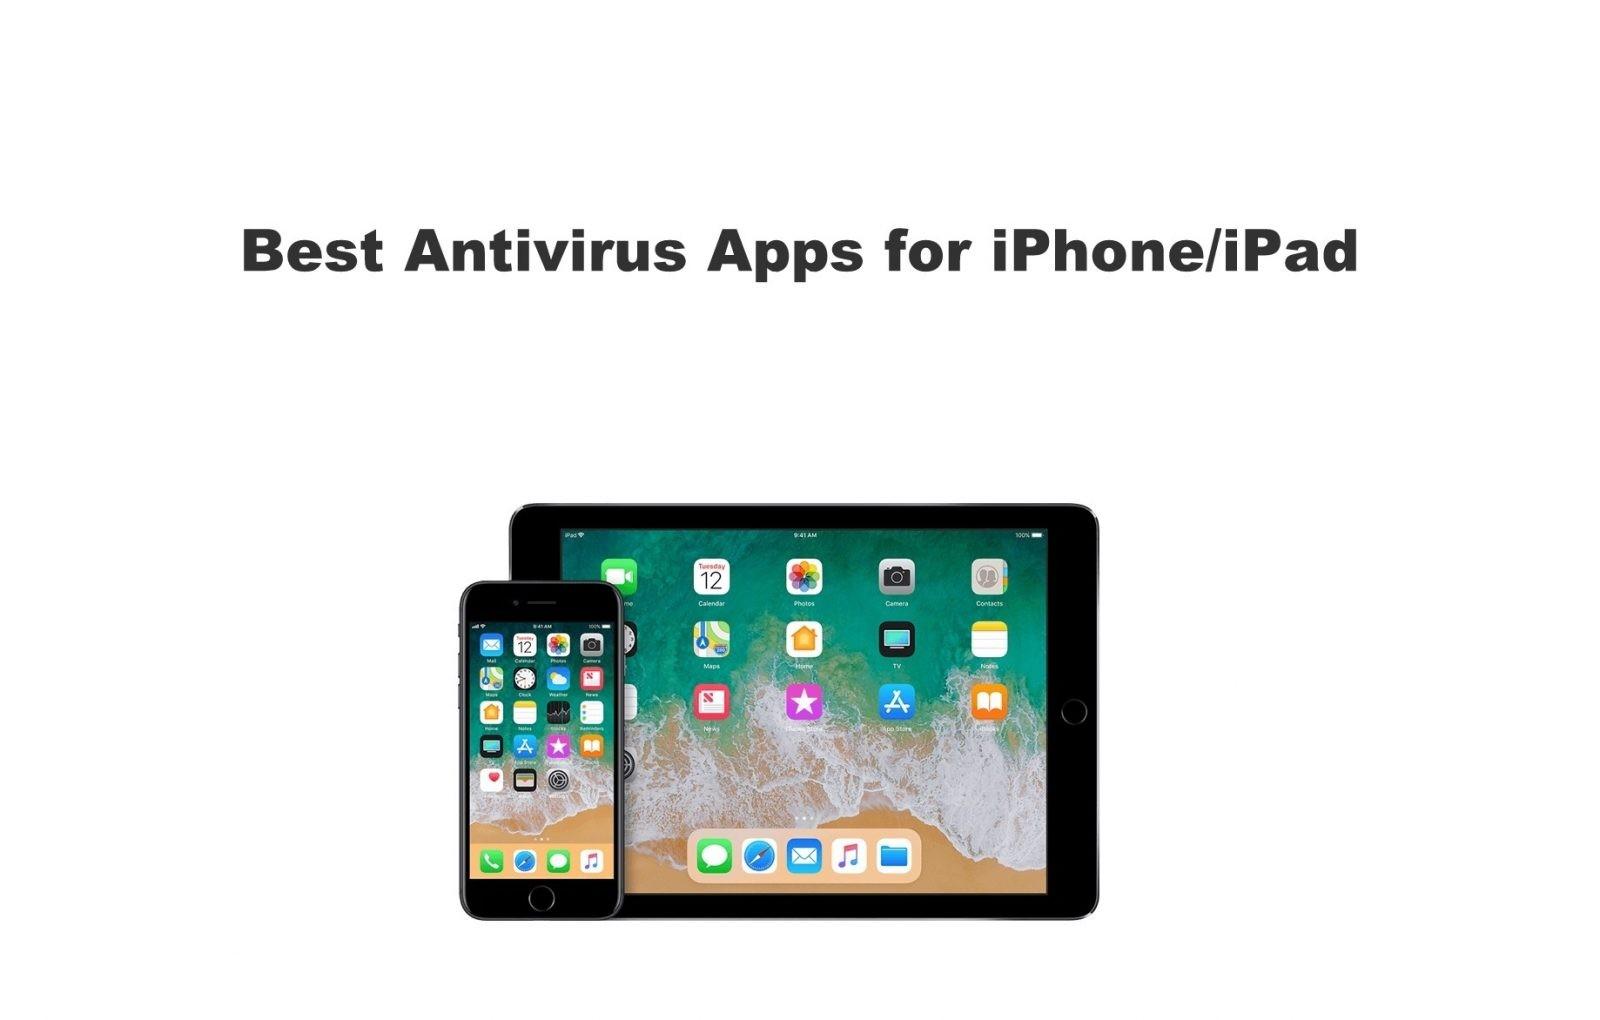 Best Antivirus Apps for iPhone/iPad in 2021